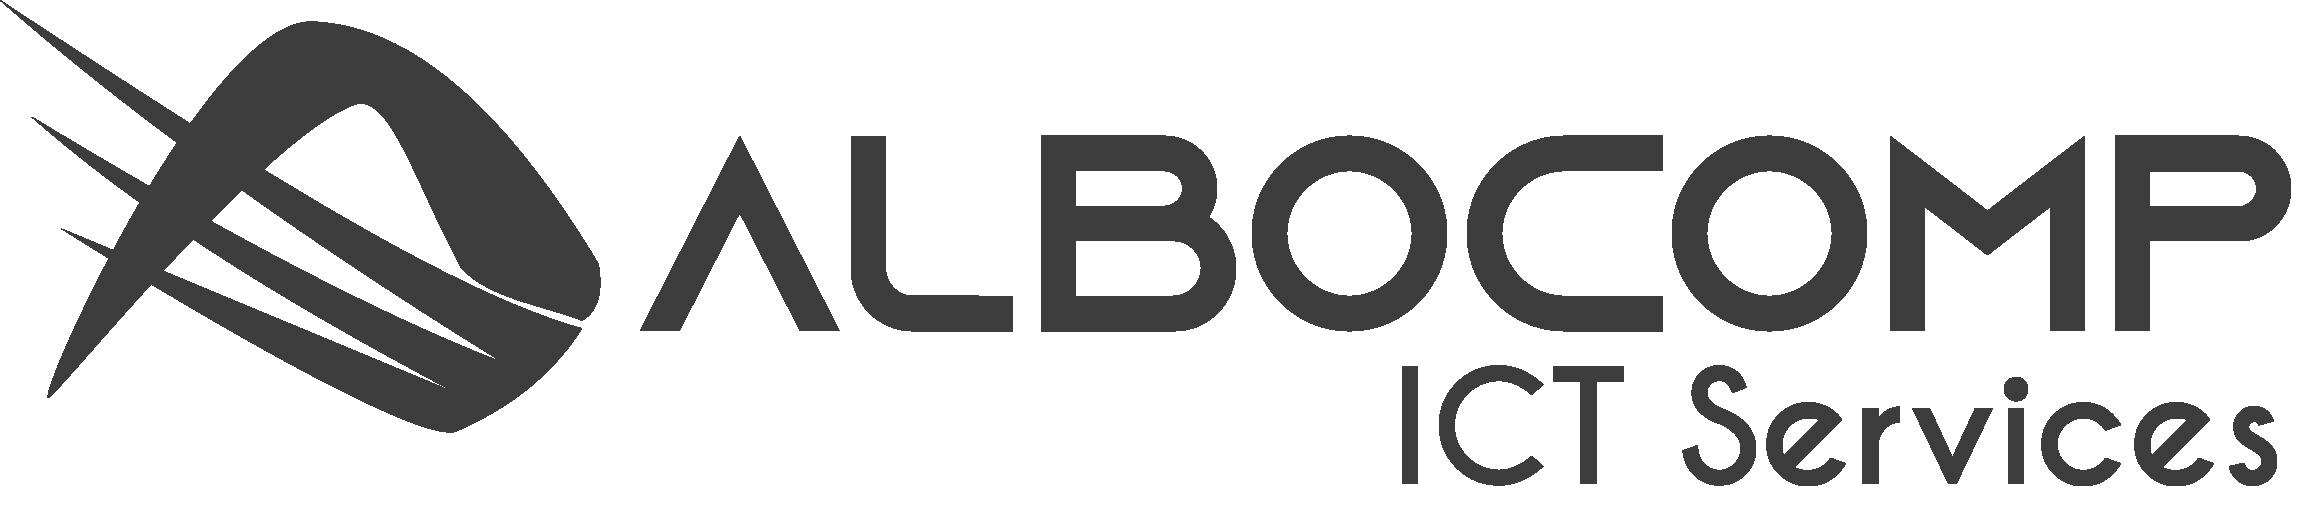 Albocomp ICT Services